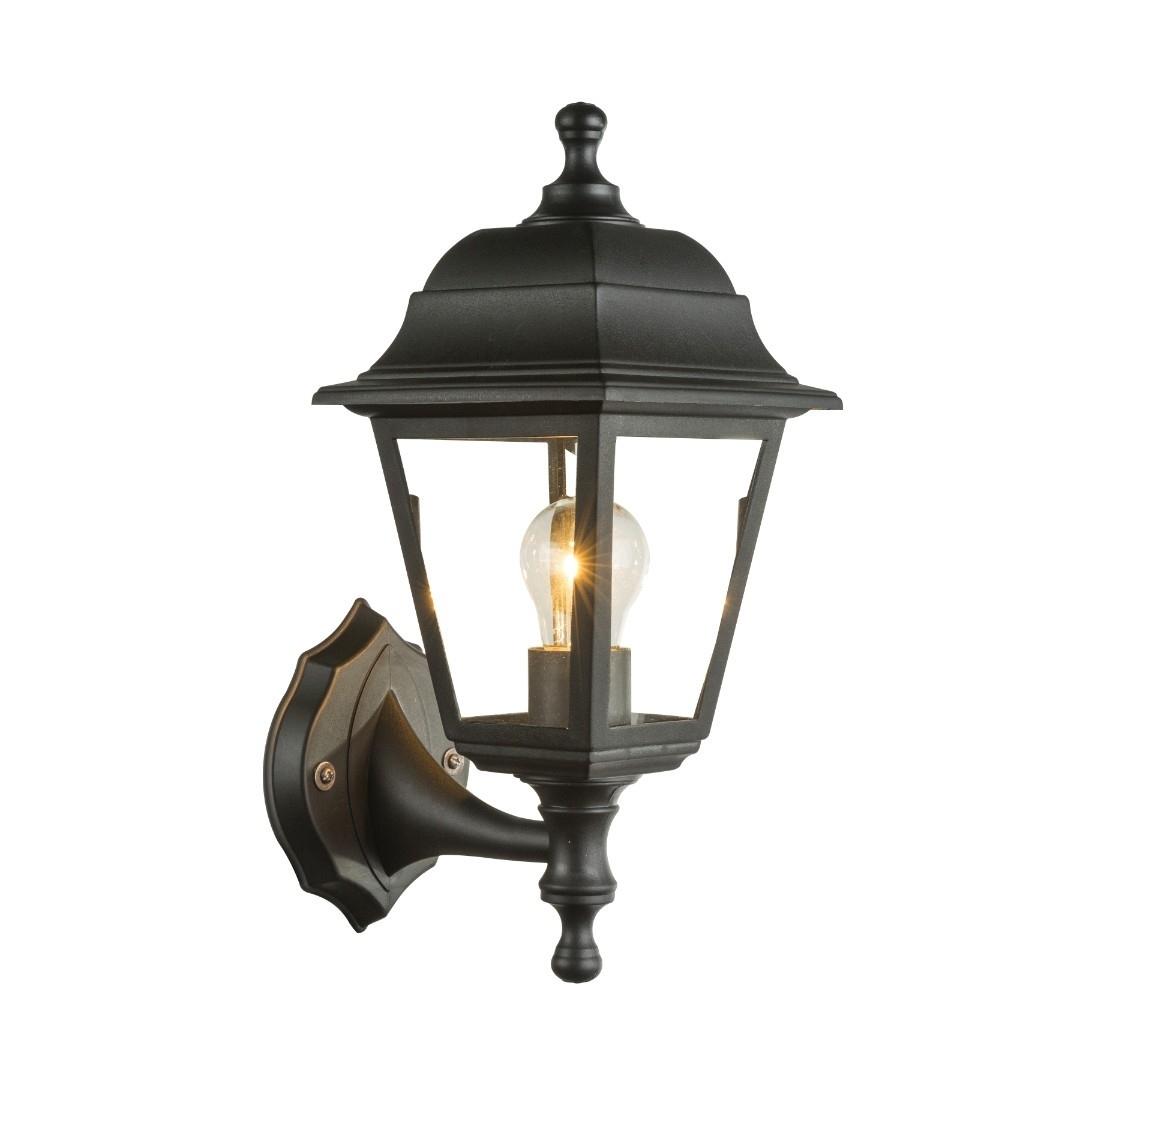 Outdoor Wall Light Globo 31885 – Big Selection Of Lights Throughout Big Outdoor Wall Lighting (#12 of 15)